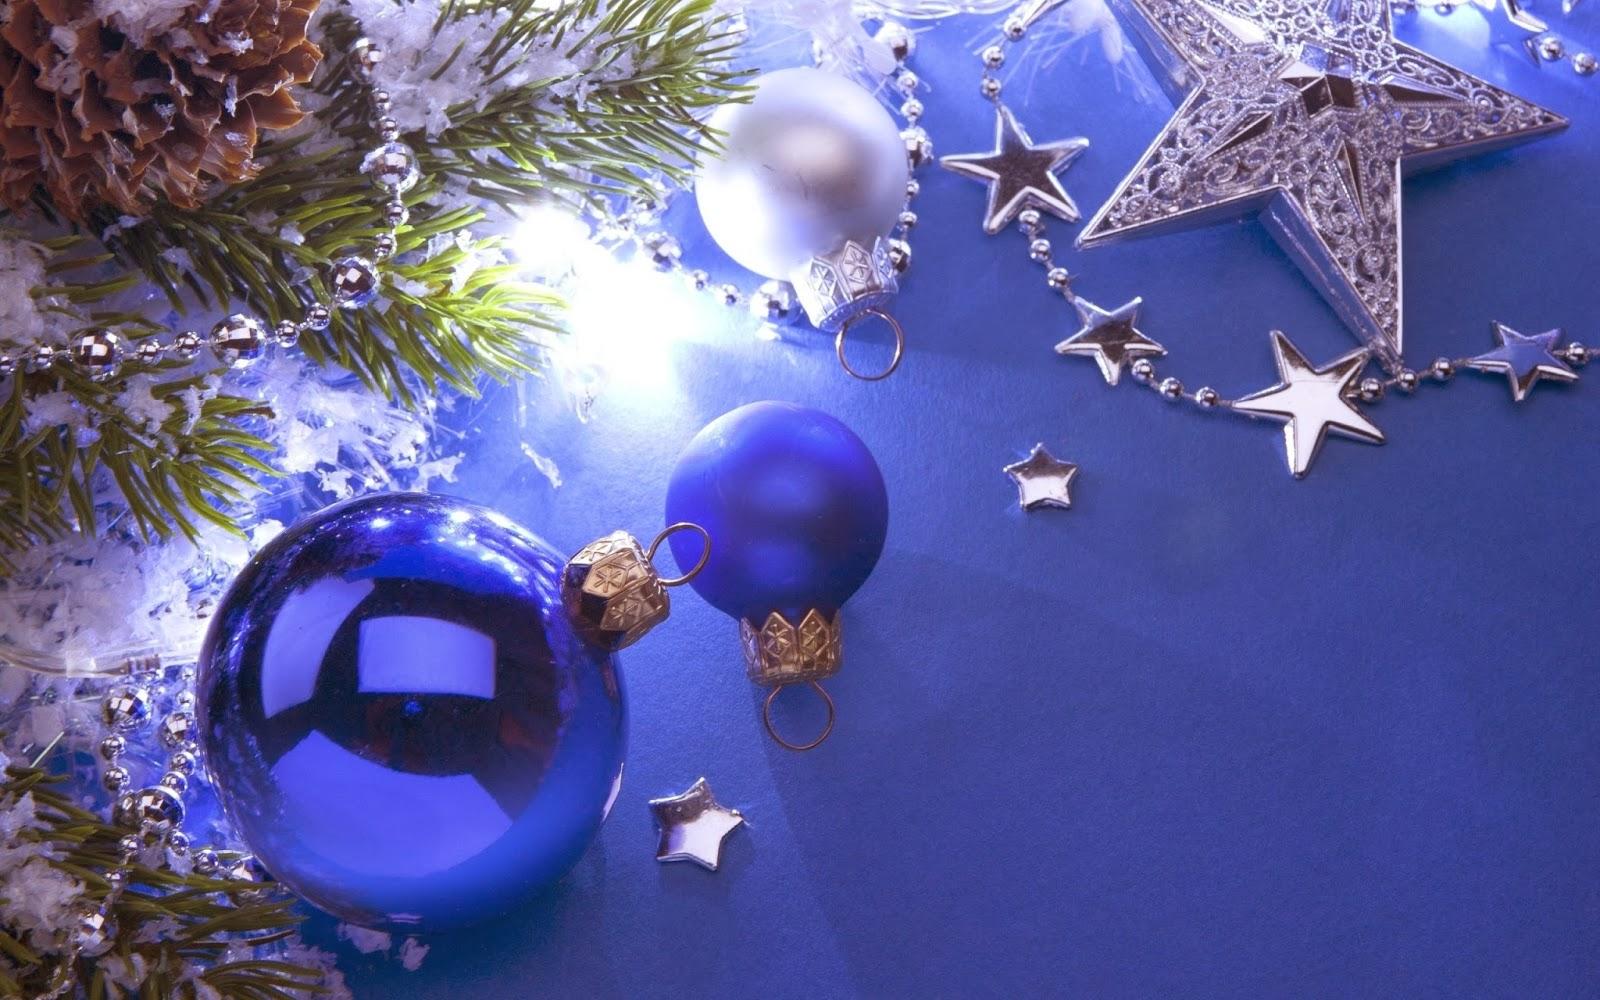 widescreen wallpaper christmas presents - photo #42